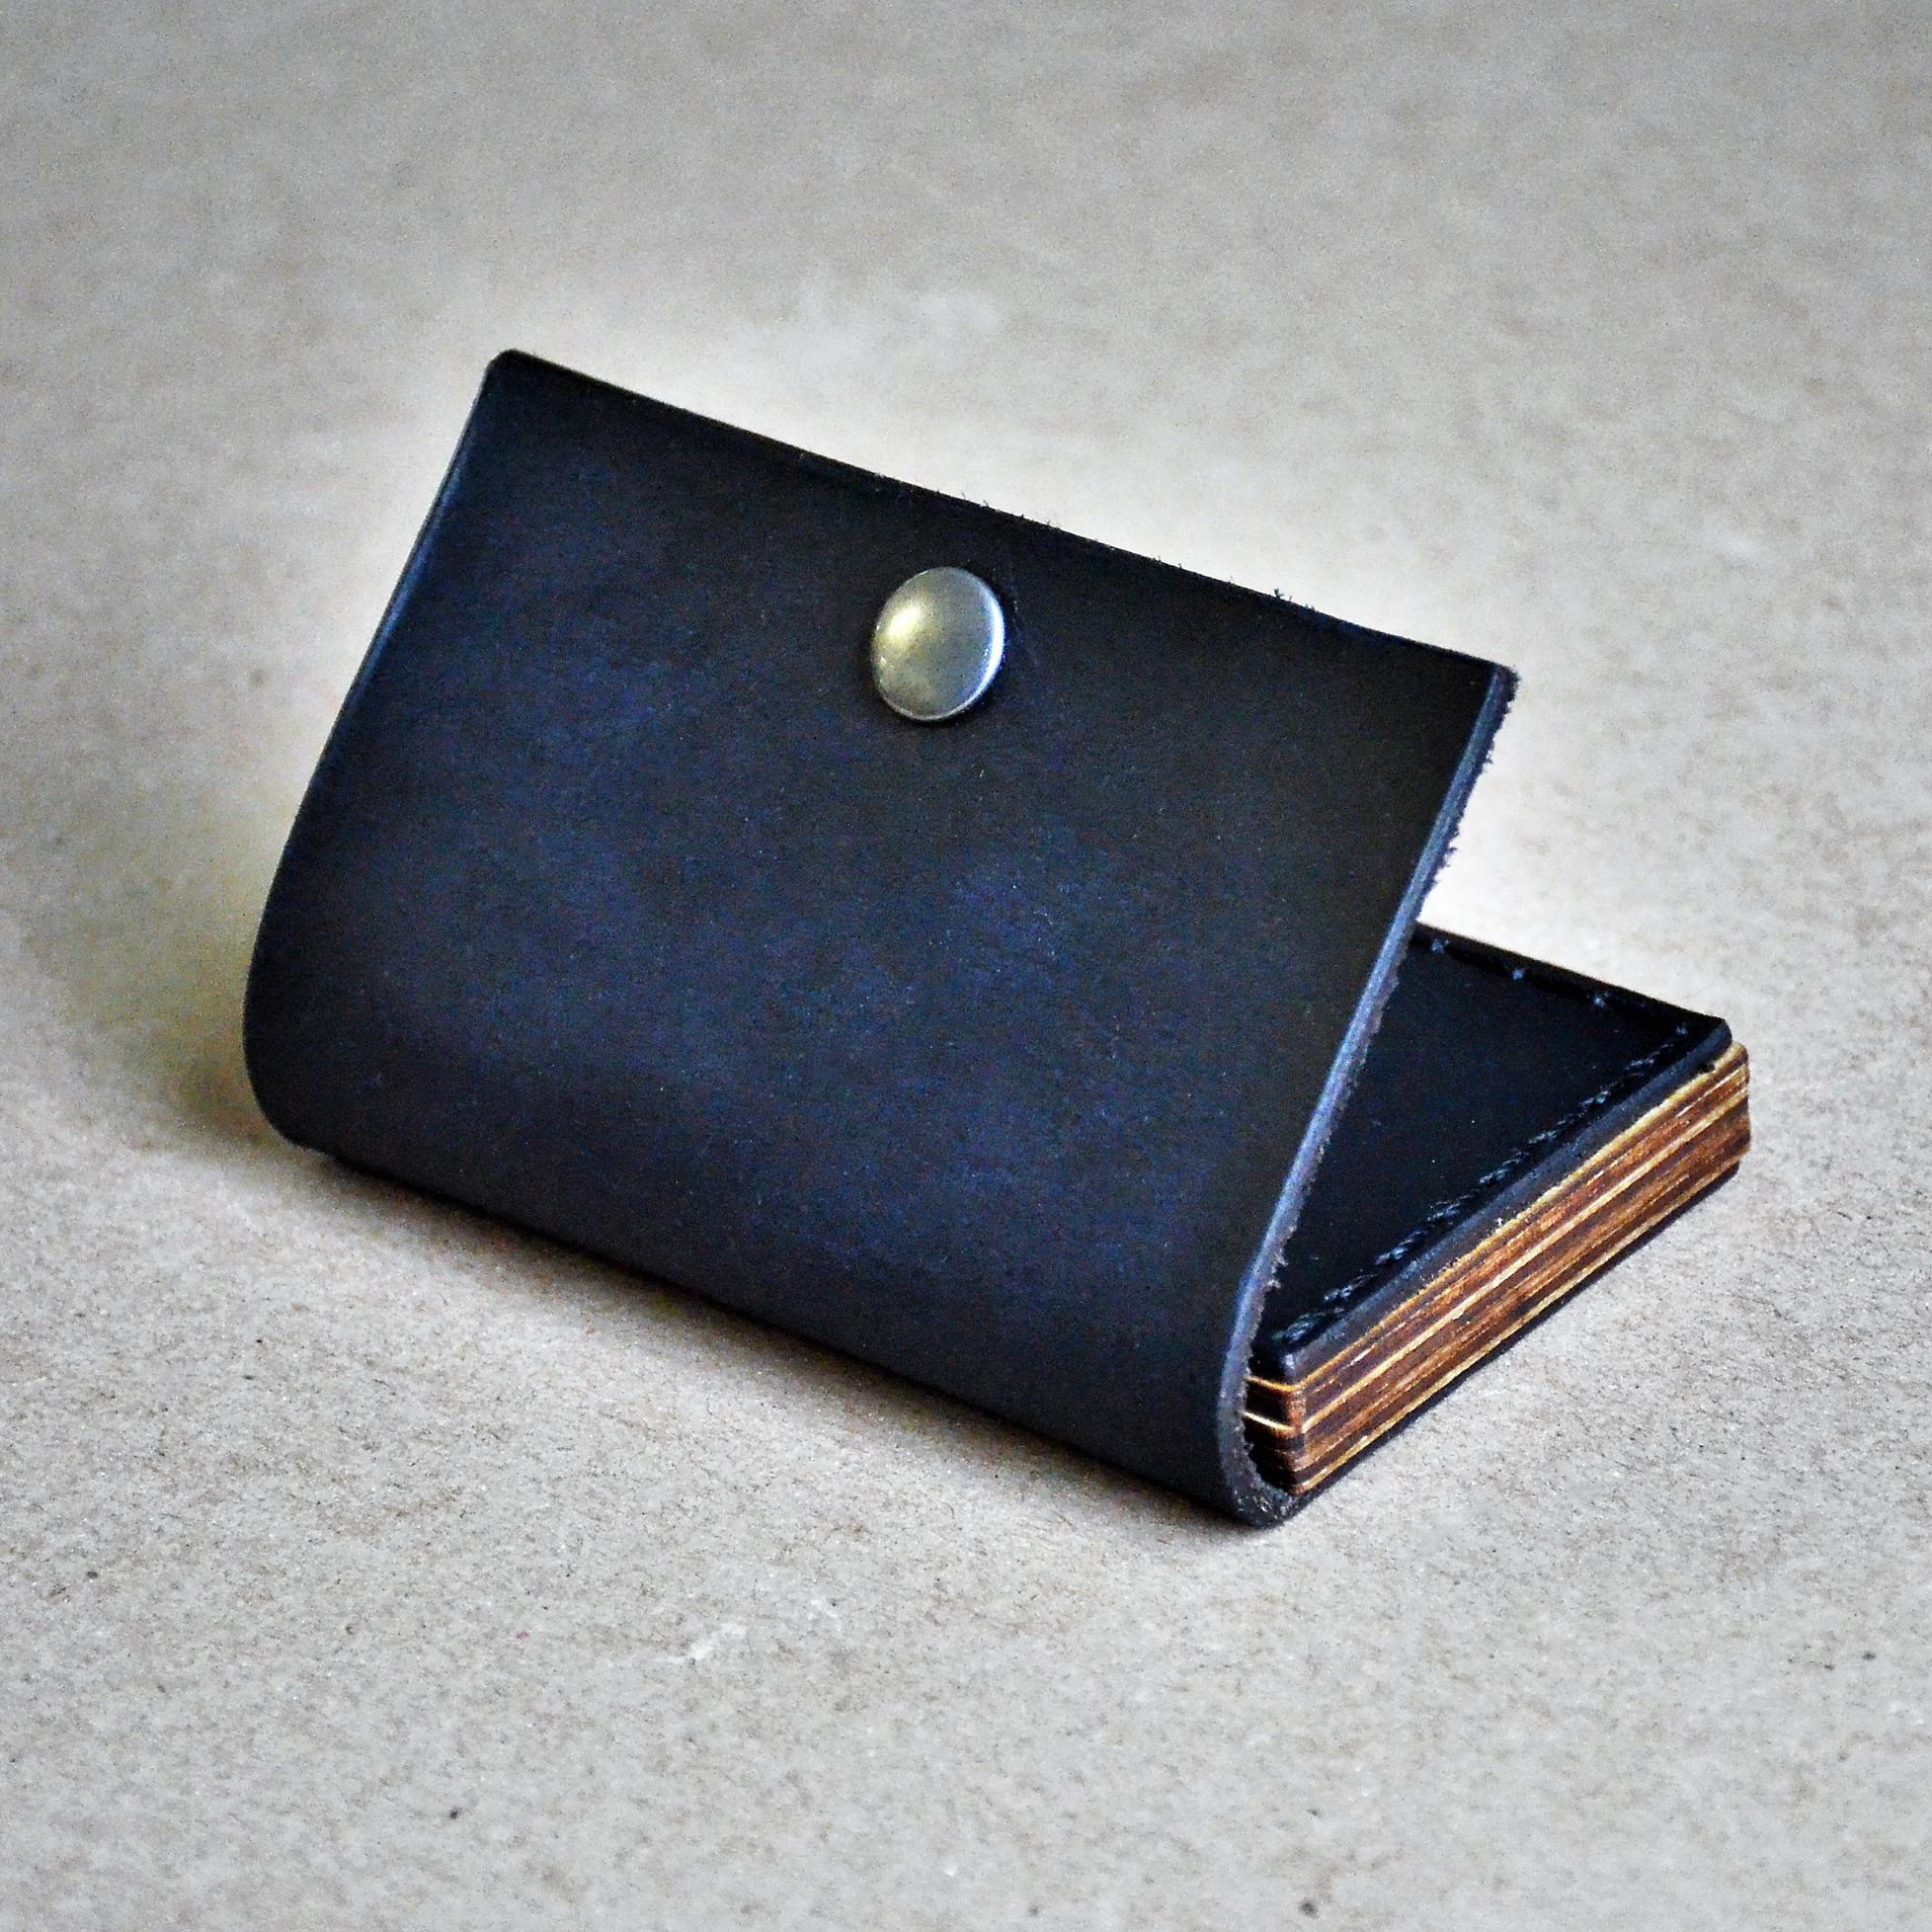 hot sale online 78280 6328c Business Card Wallet//Minimal Modern Rugged Simple Card Holder Case//Oiled  Leather & Wood//Gift Men Boss Groomsman Bridesmaid Graduation